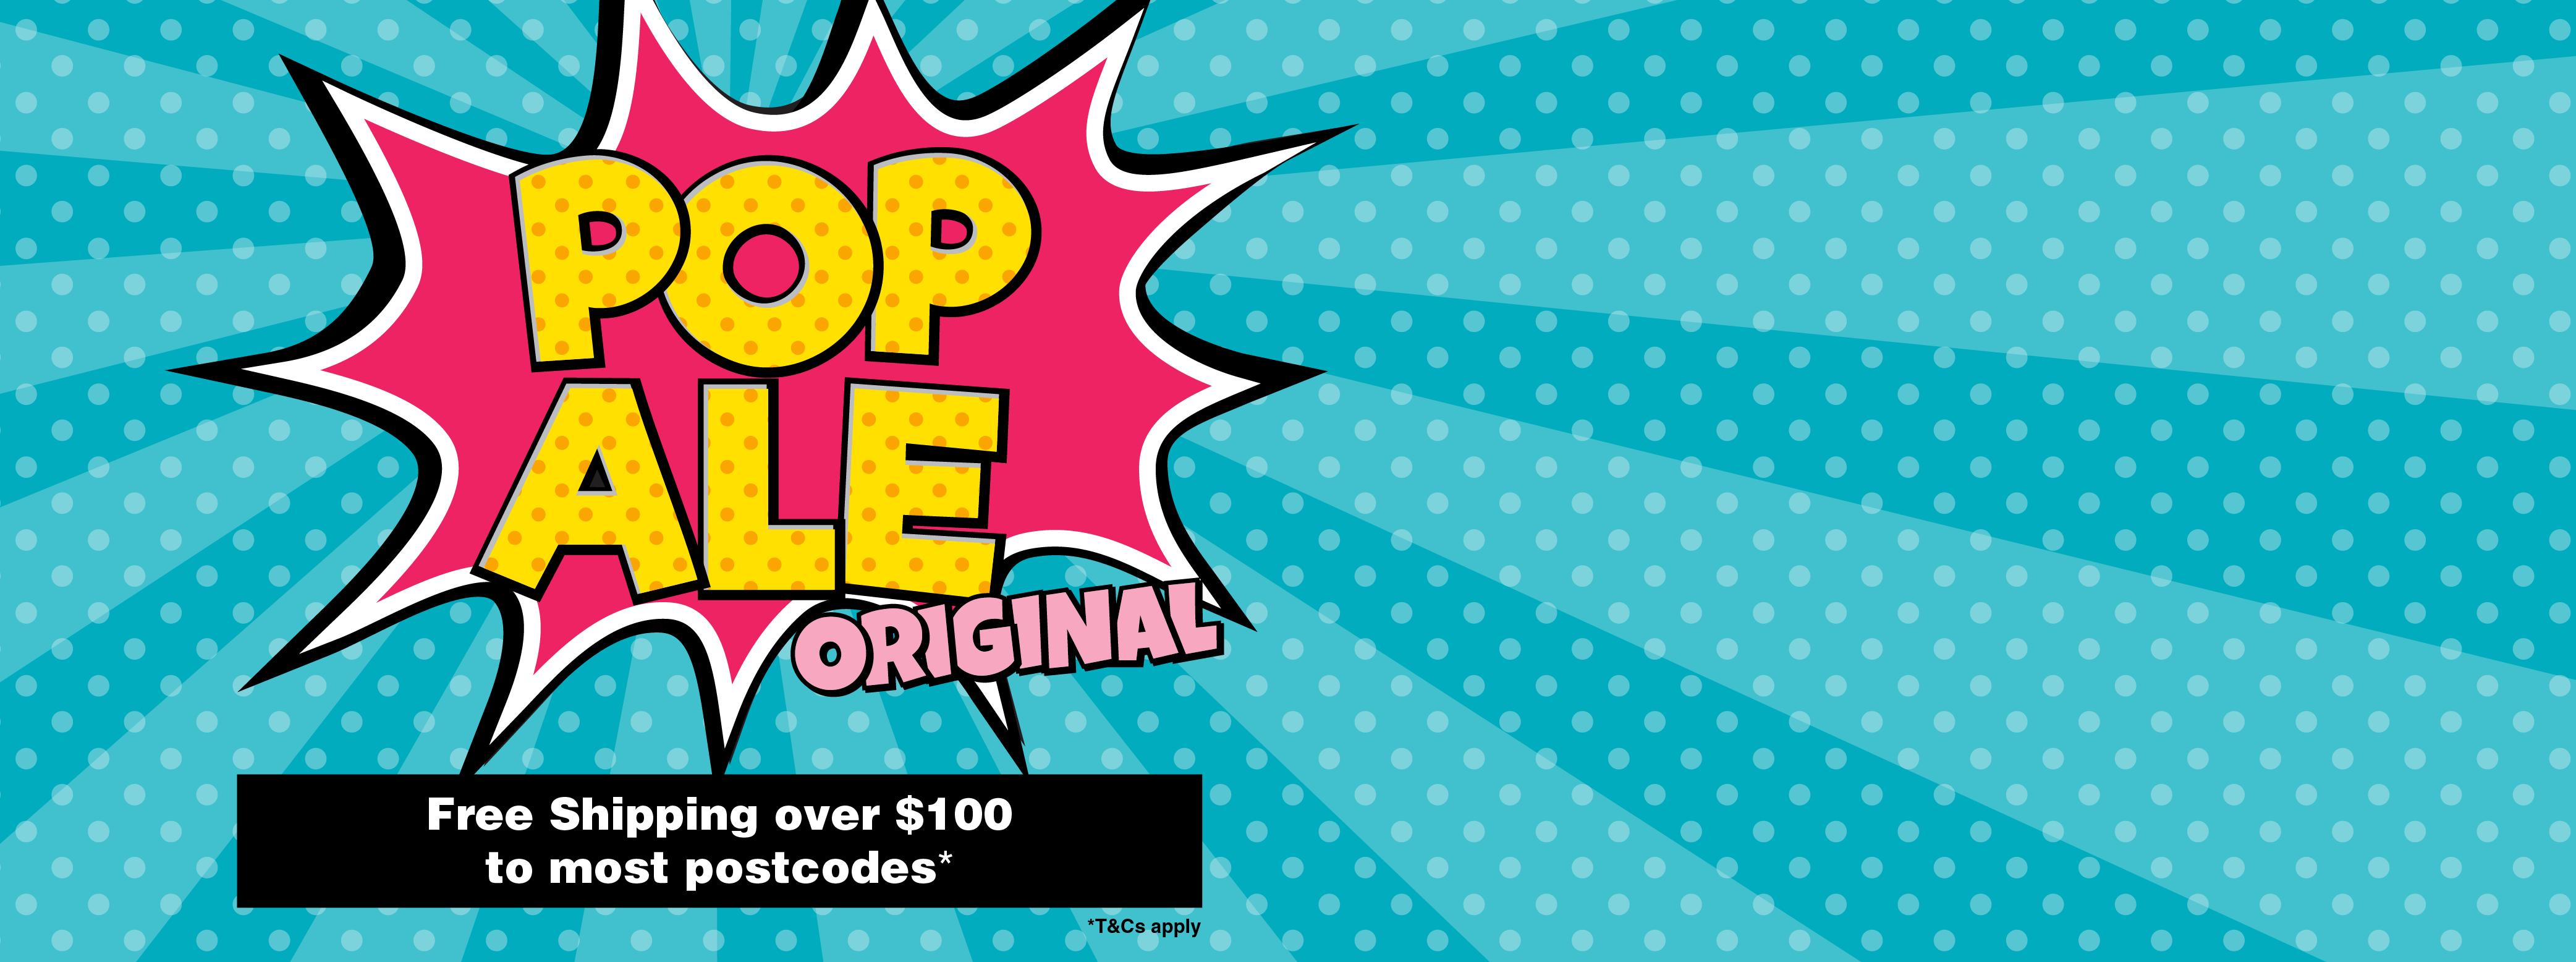 Pop Ale Slide 100 FreeShipping